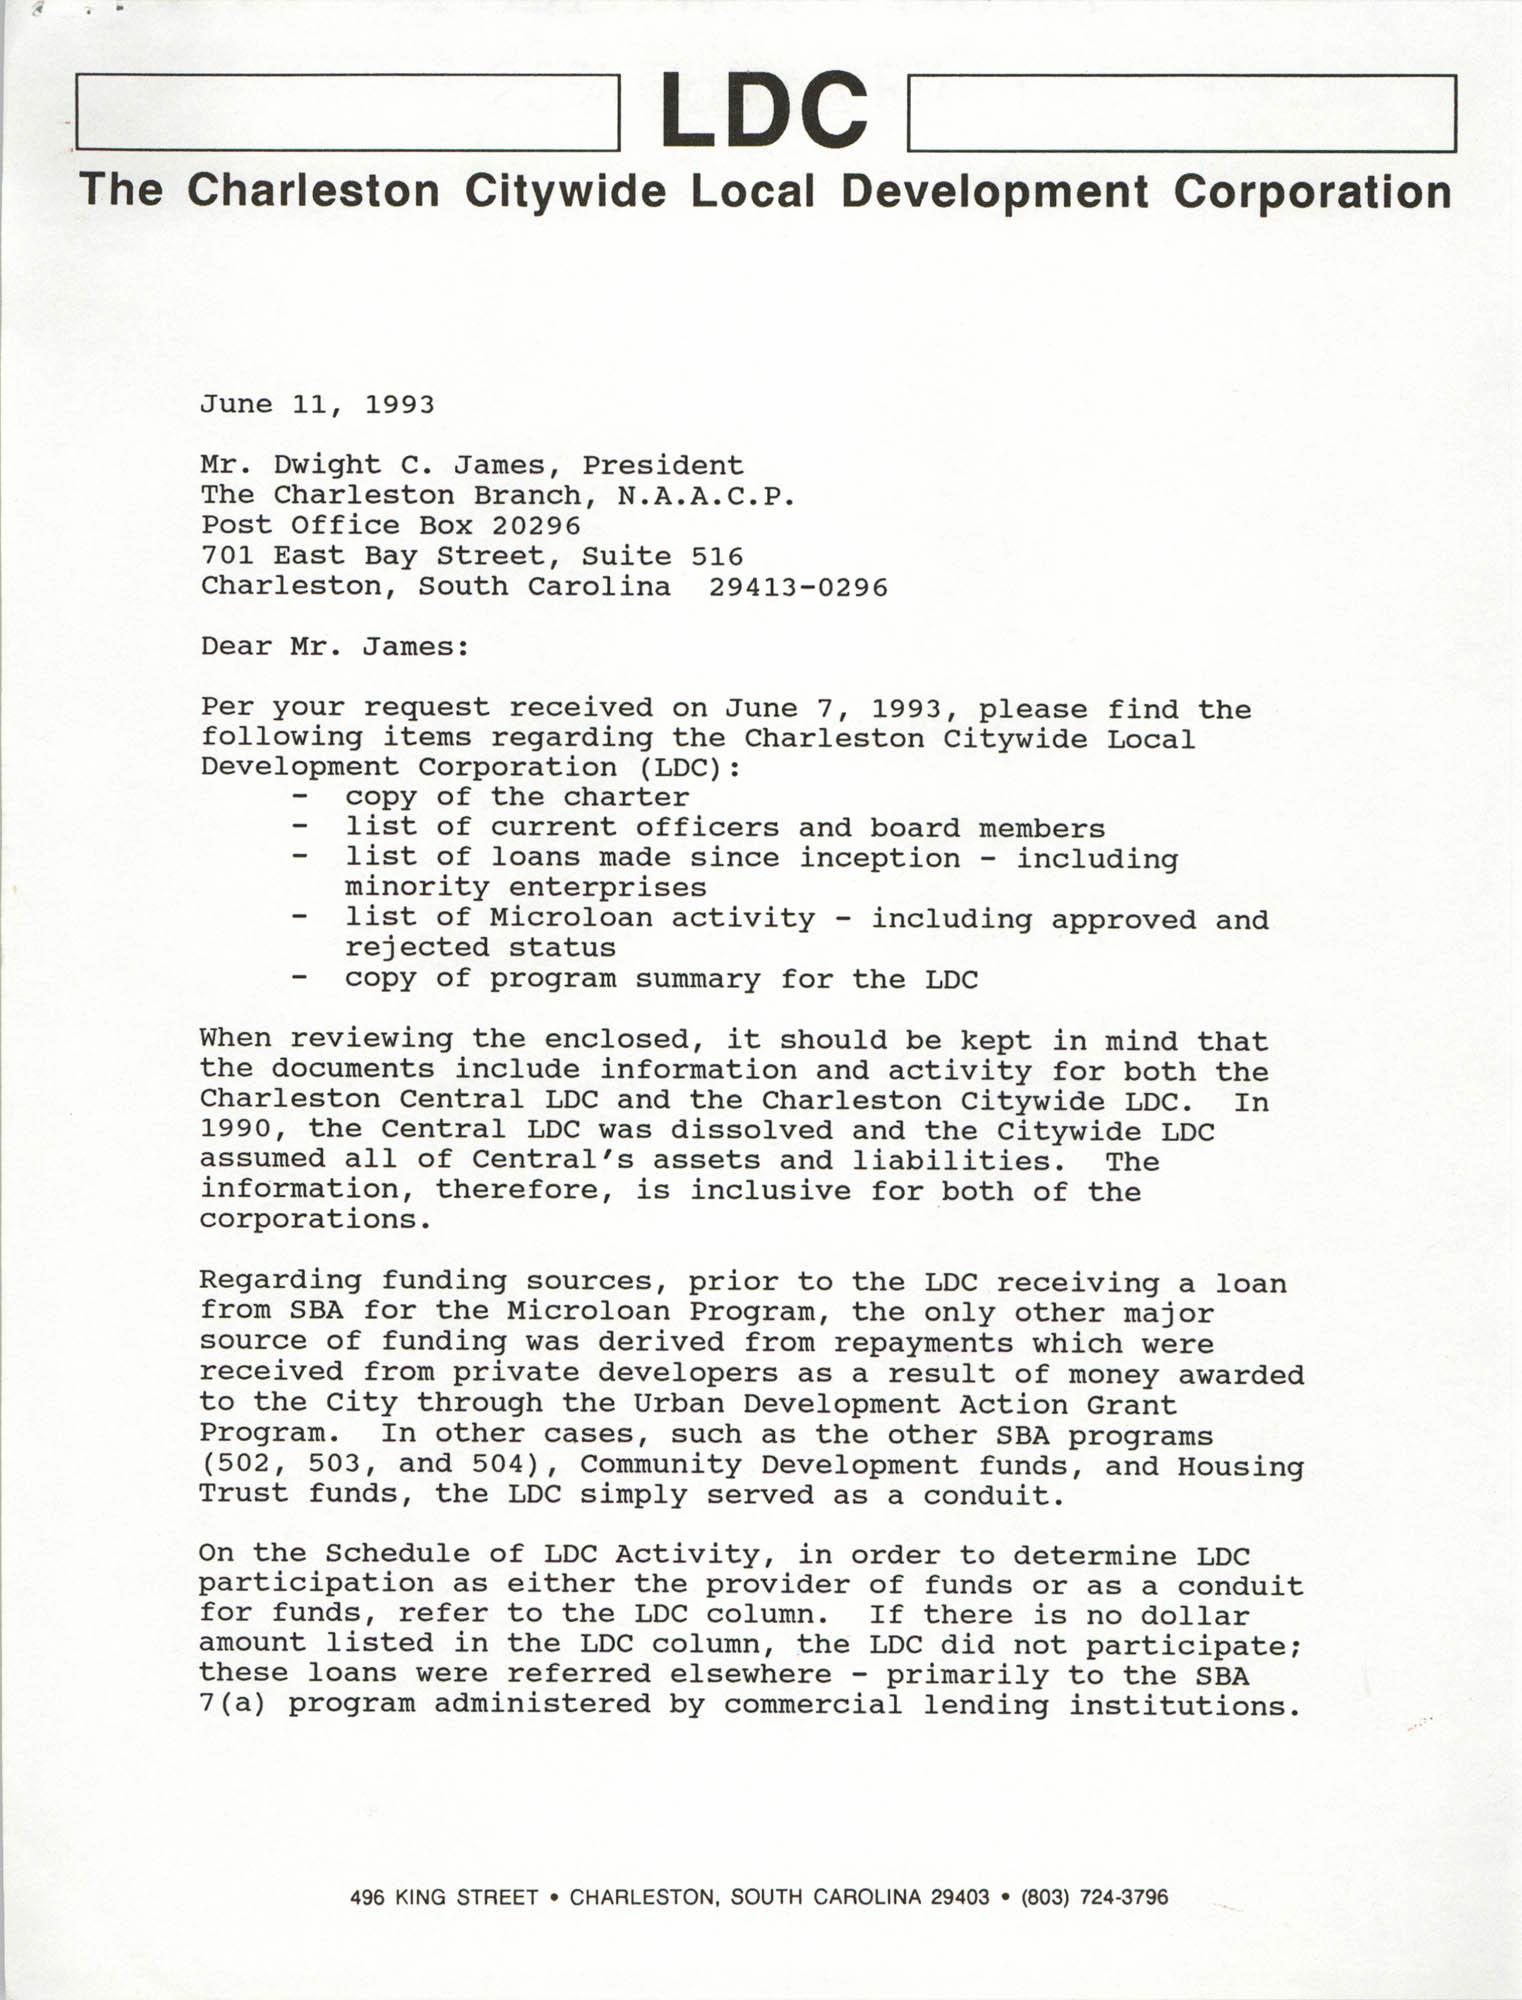 The Charleston Citywide Local Development Corporation Documents, June 11, 1993